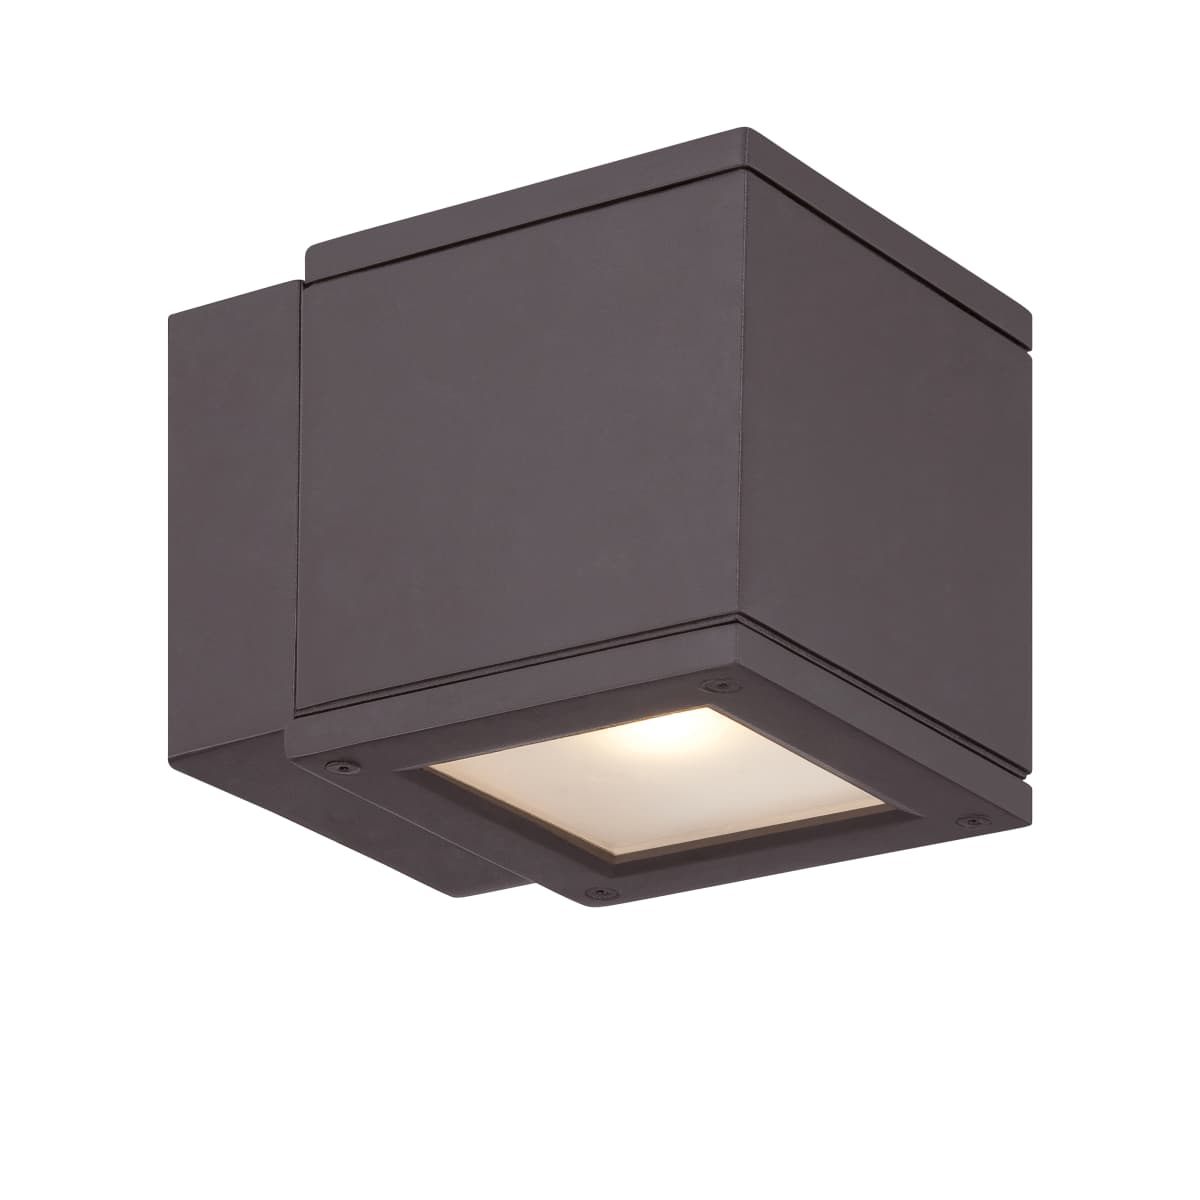 WS-W2505-BZ Bronze WAC Lighting Rubix Energy Star LED Up and Down Wall Light